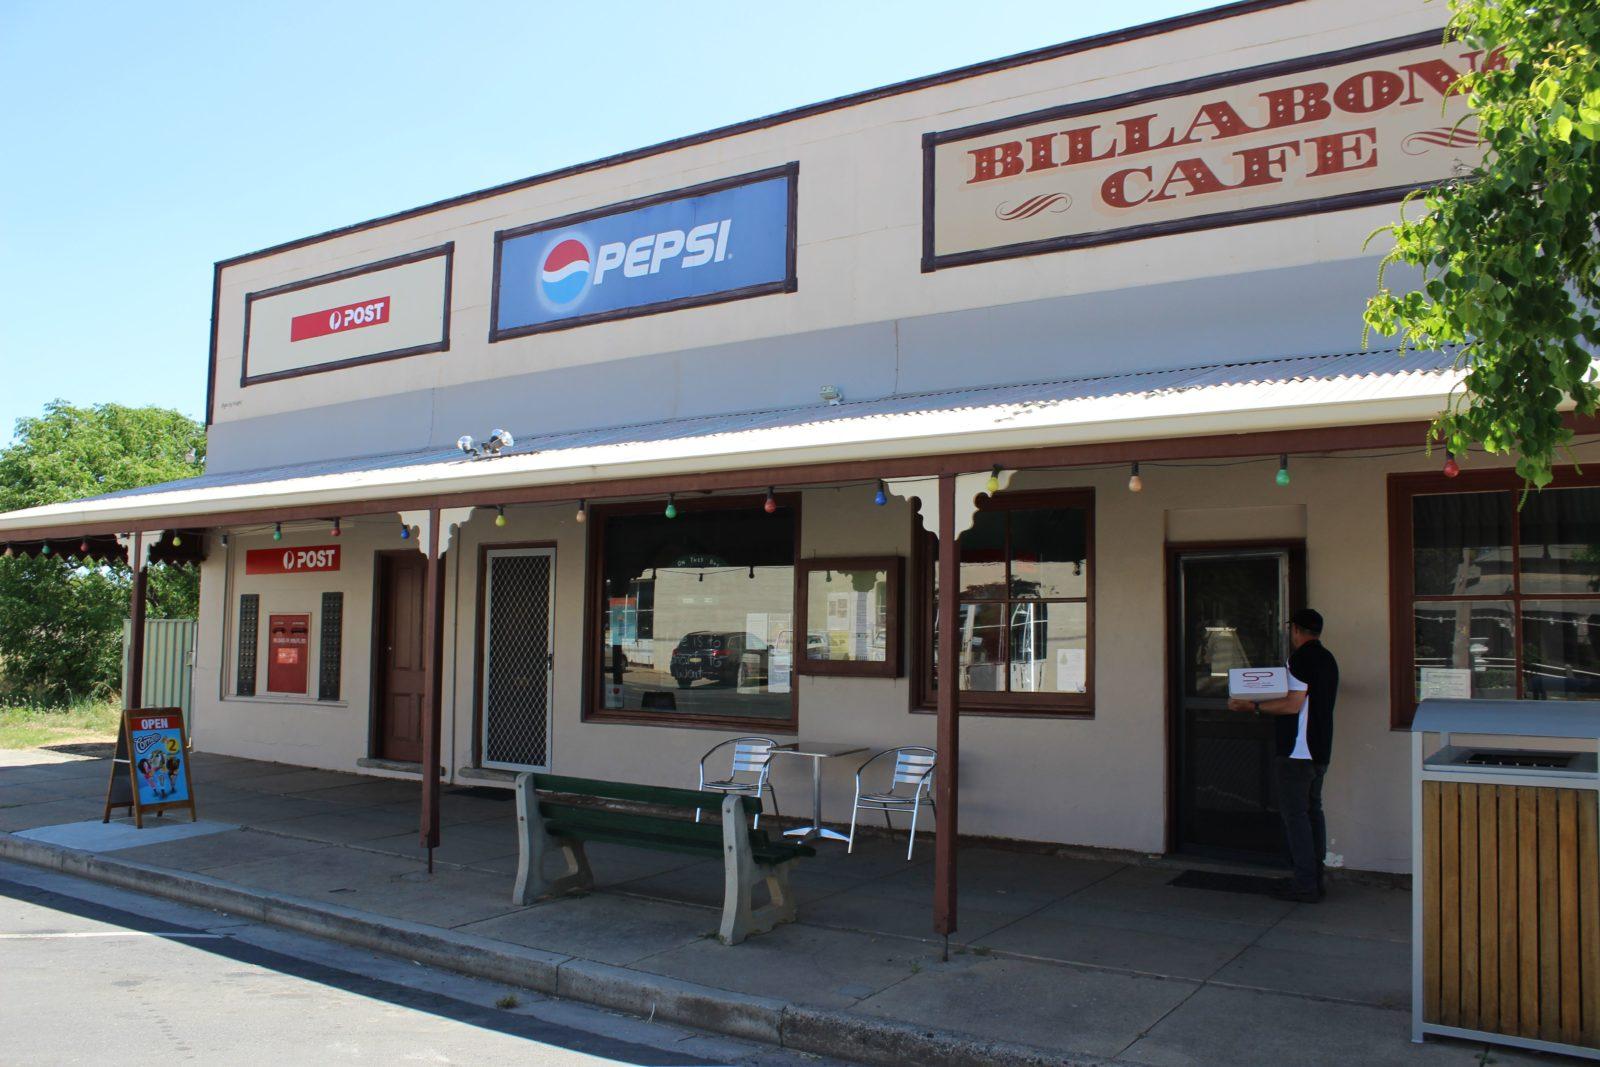 Billabong Cafe Walla Walla